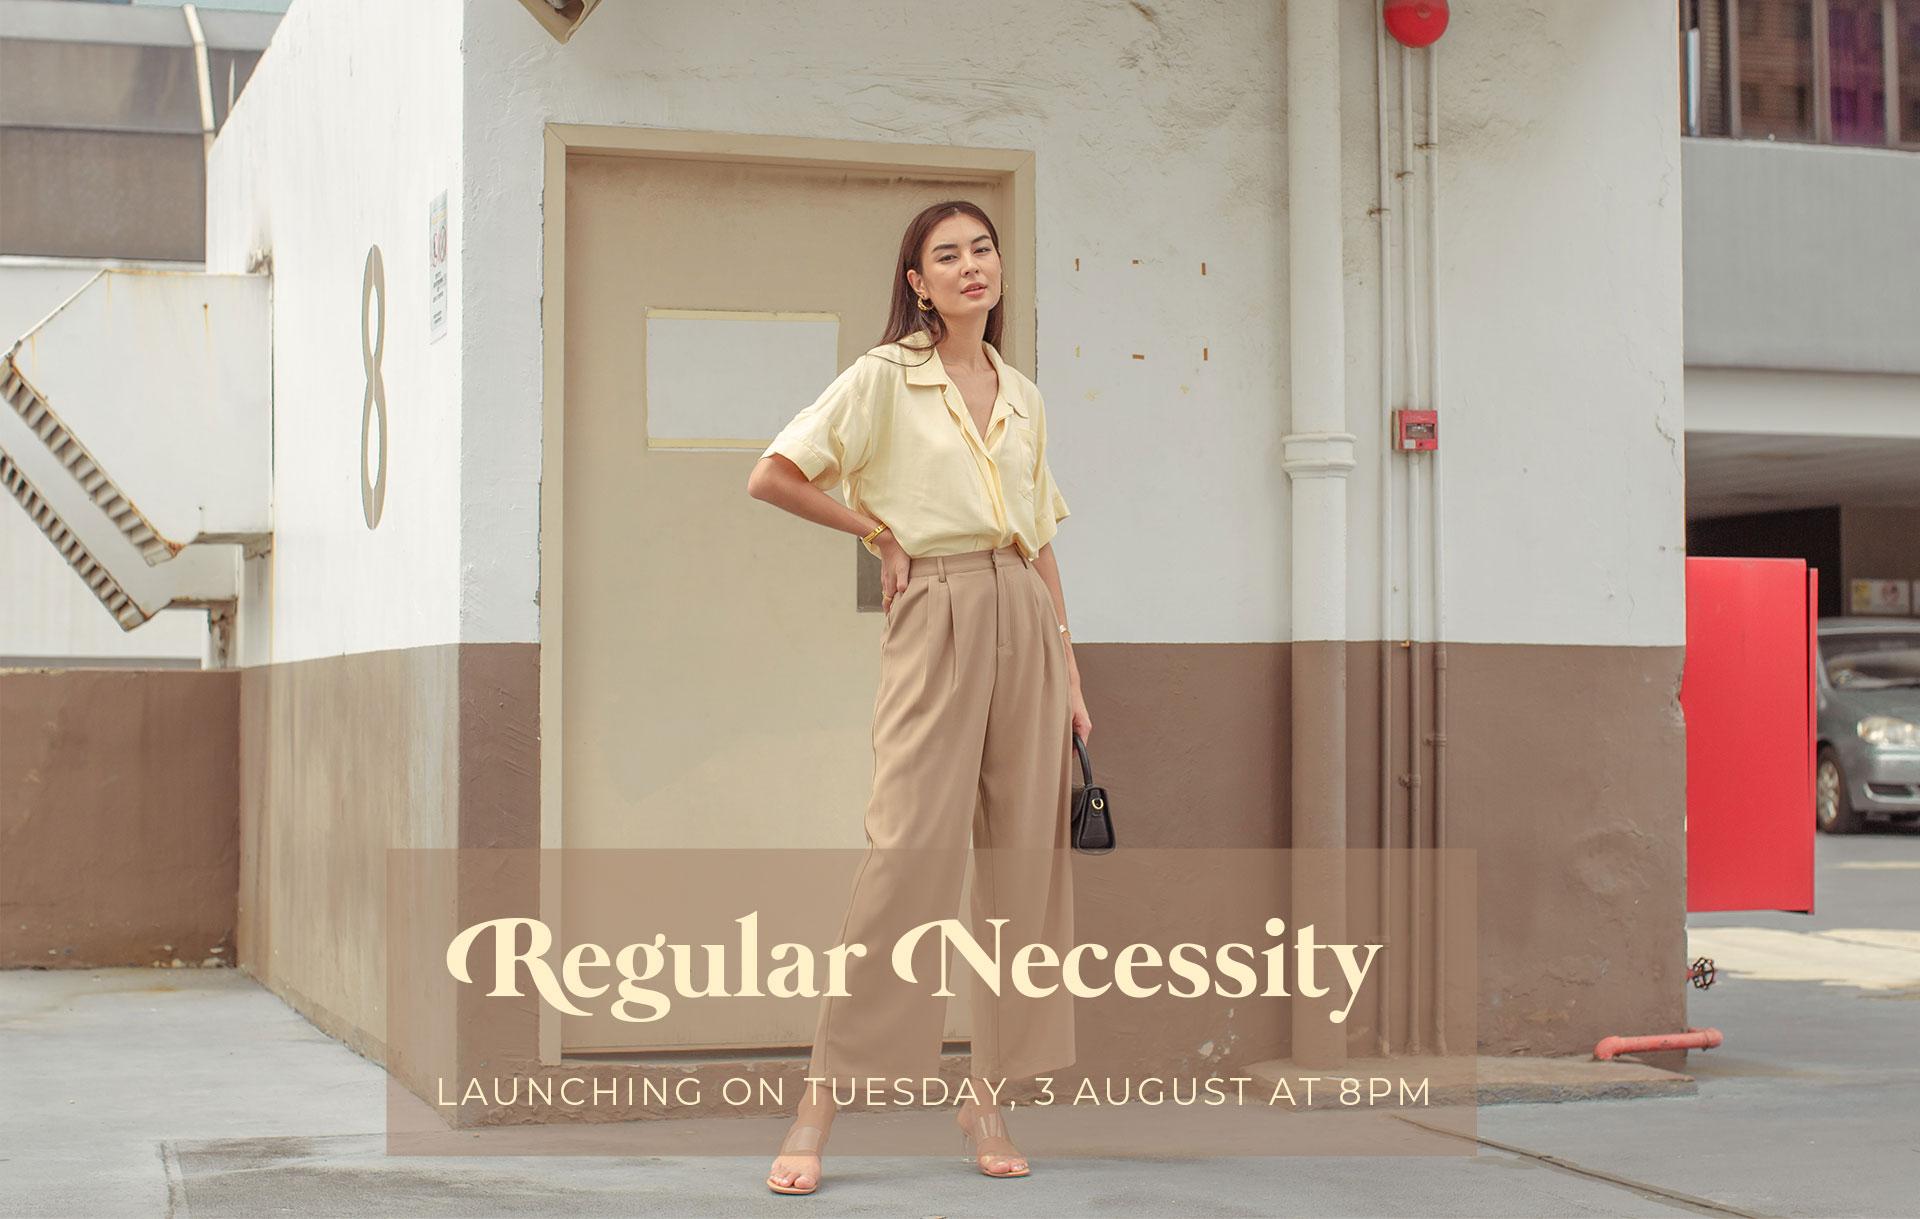 Regular Necessity